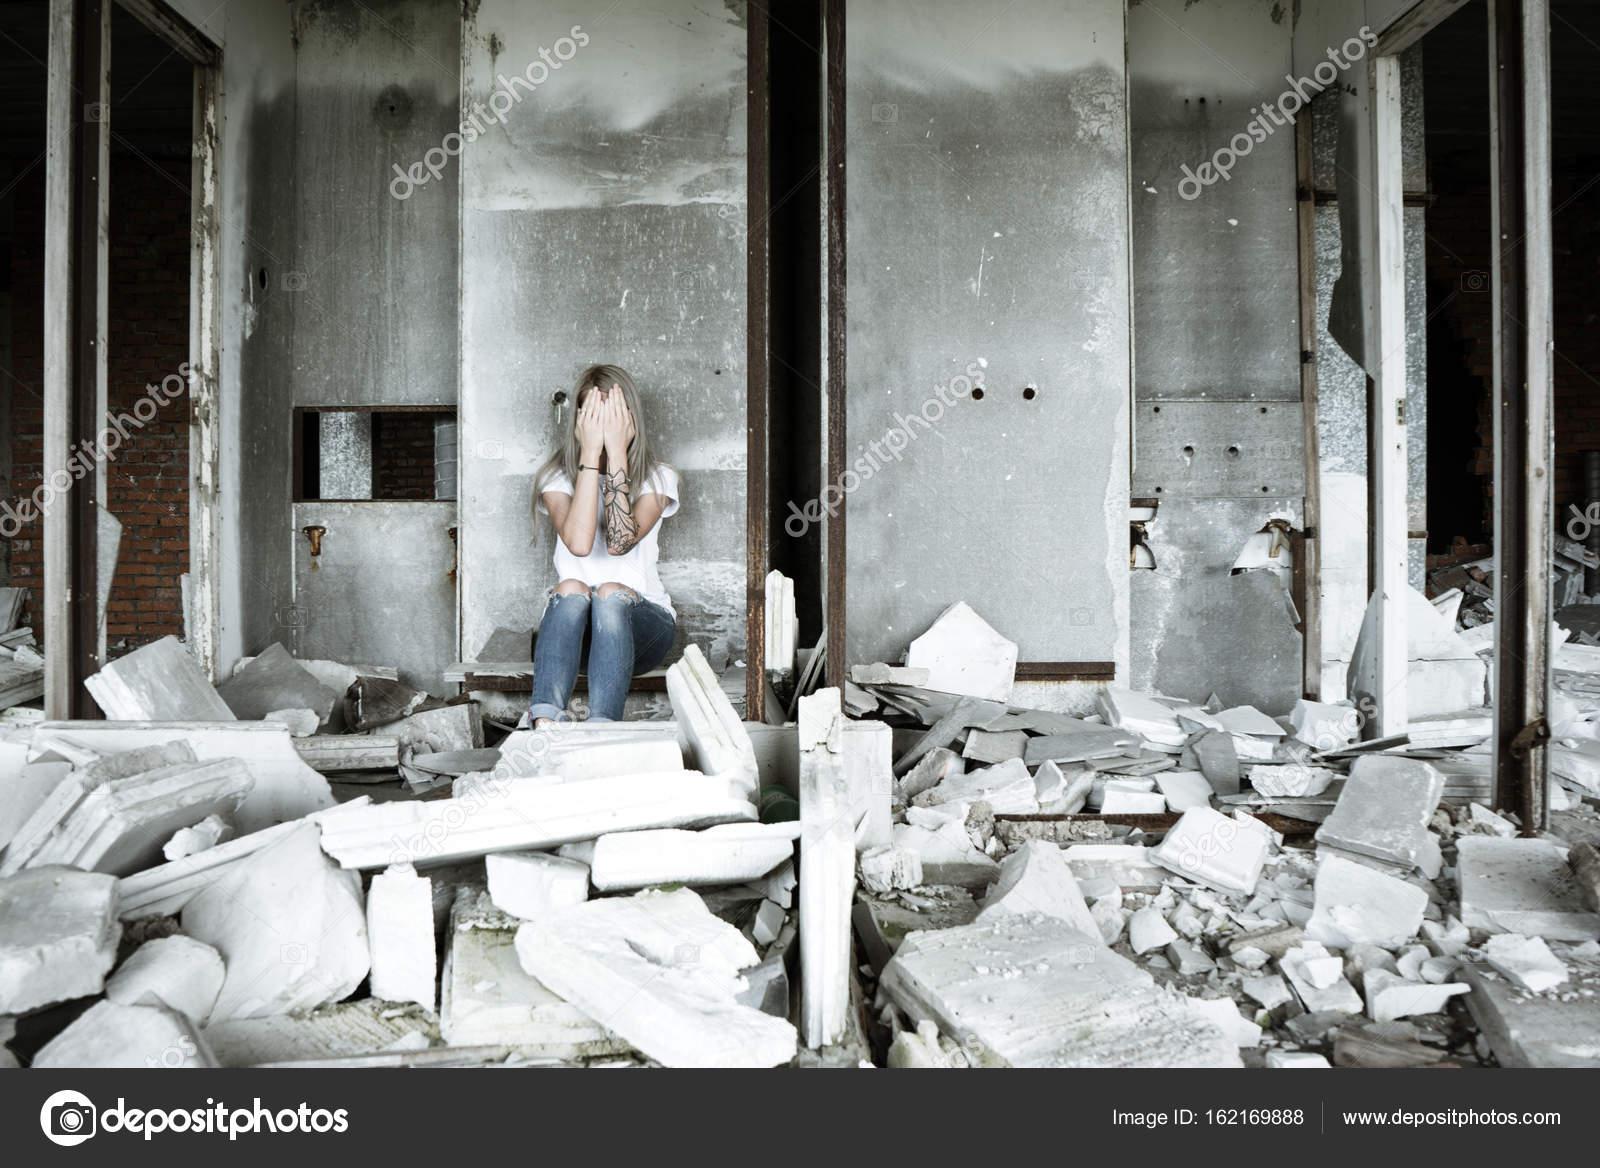 foto-odinokih-devushek-doma-porno-foto-kormyashih-sisek